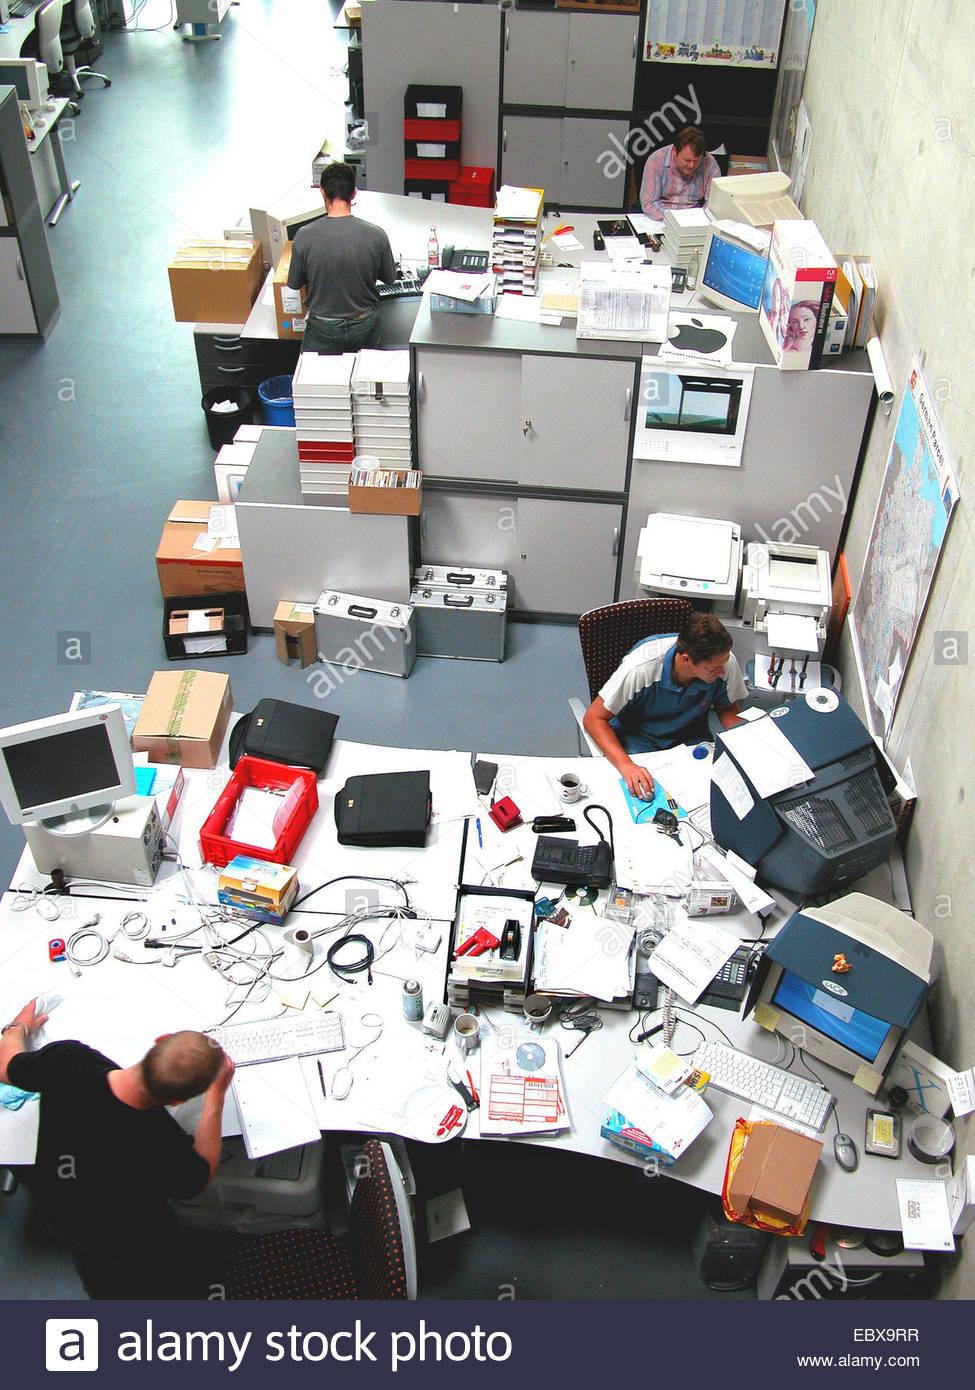 Open-plan office - Stock Image